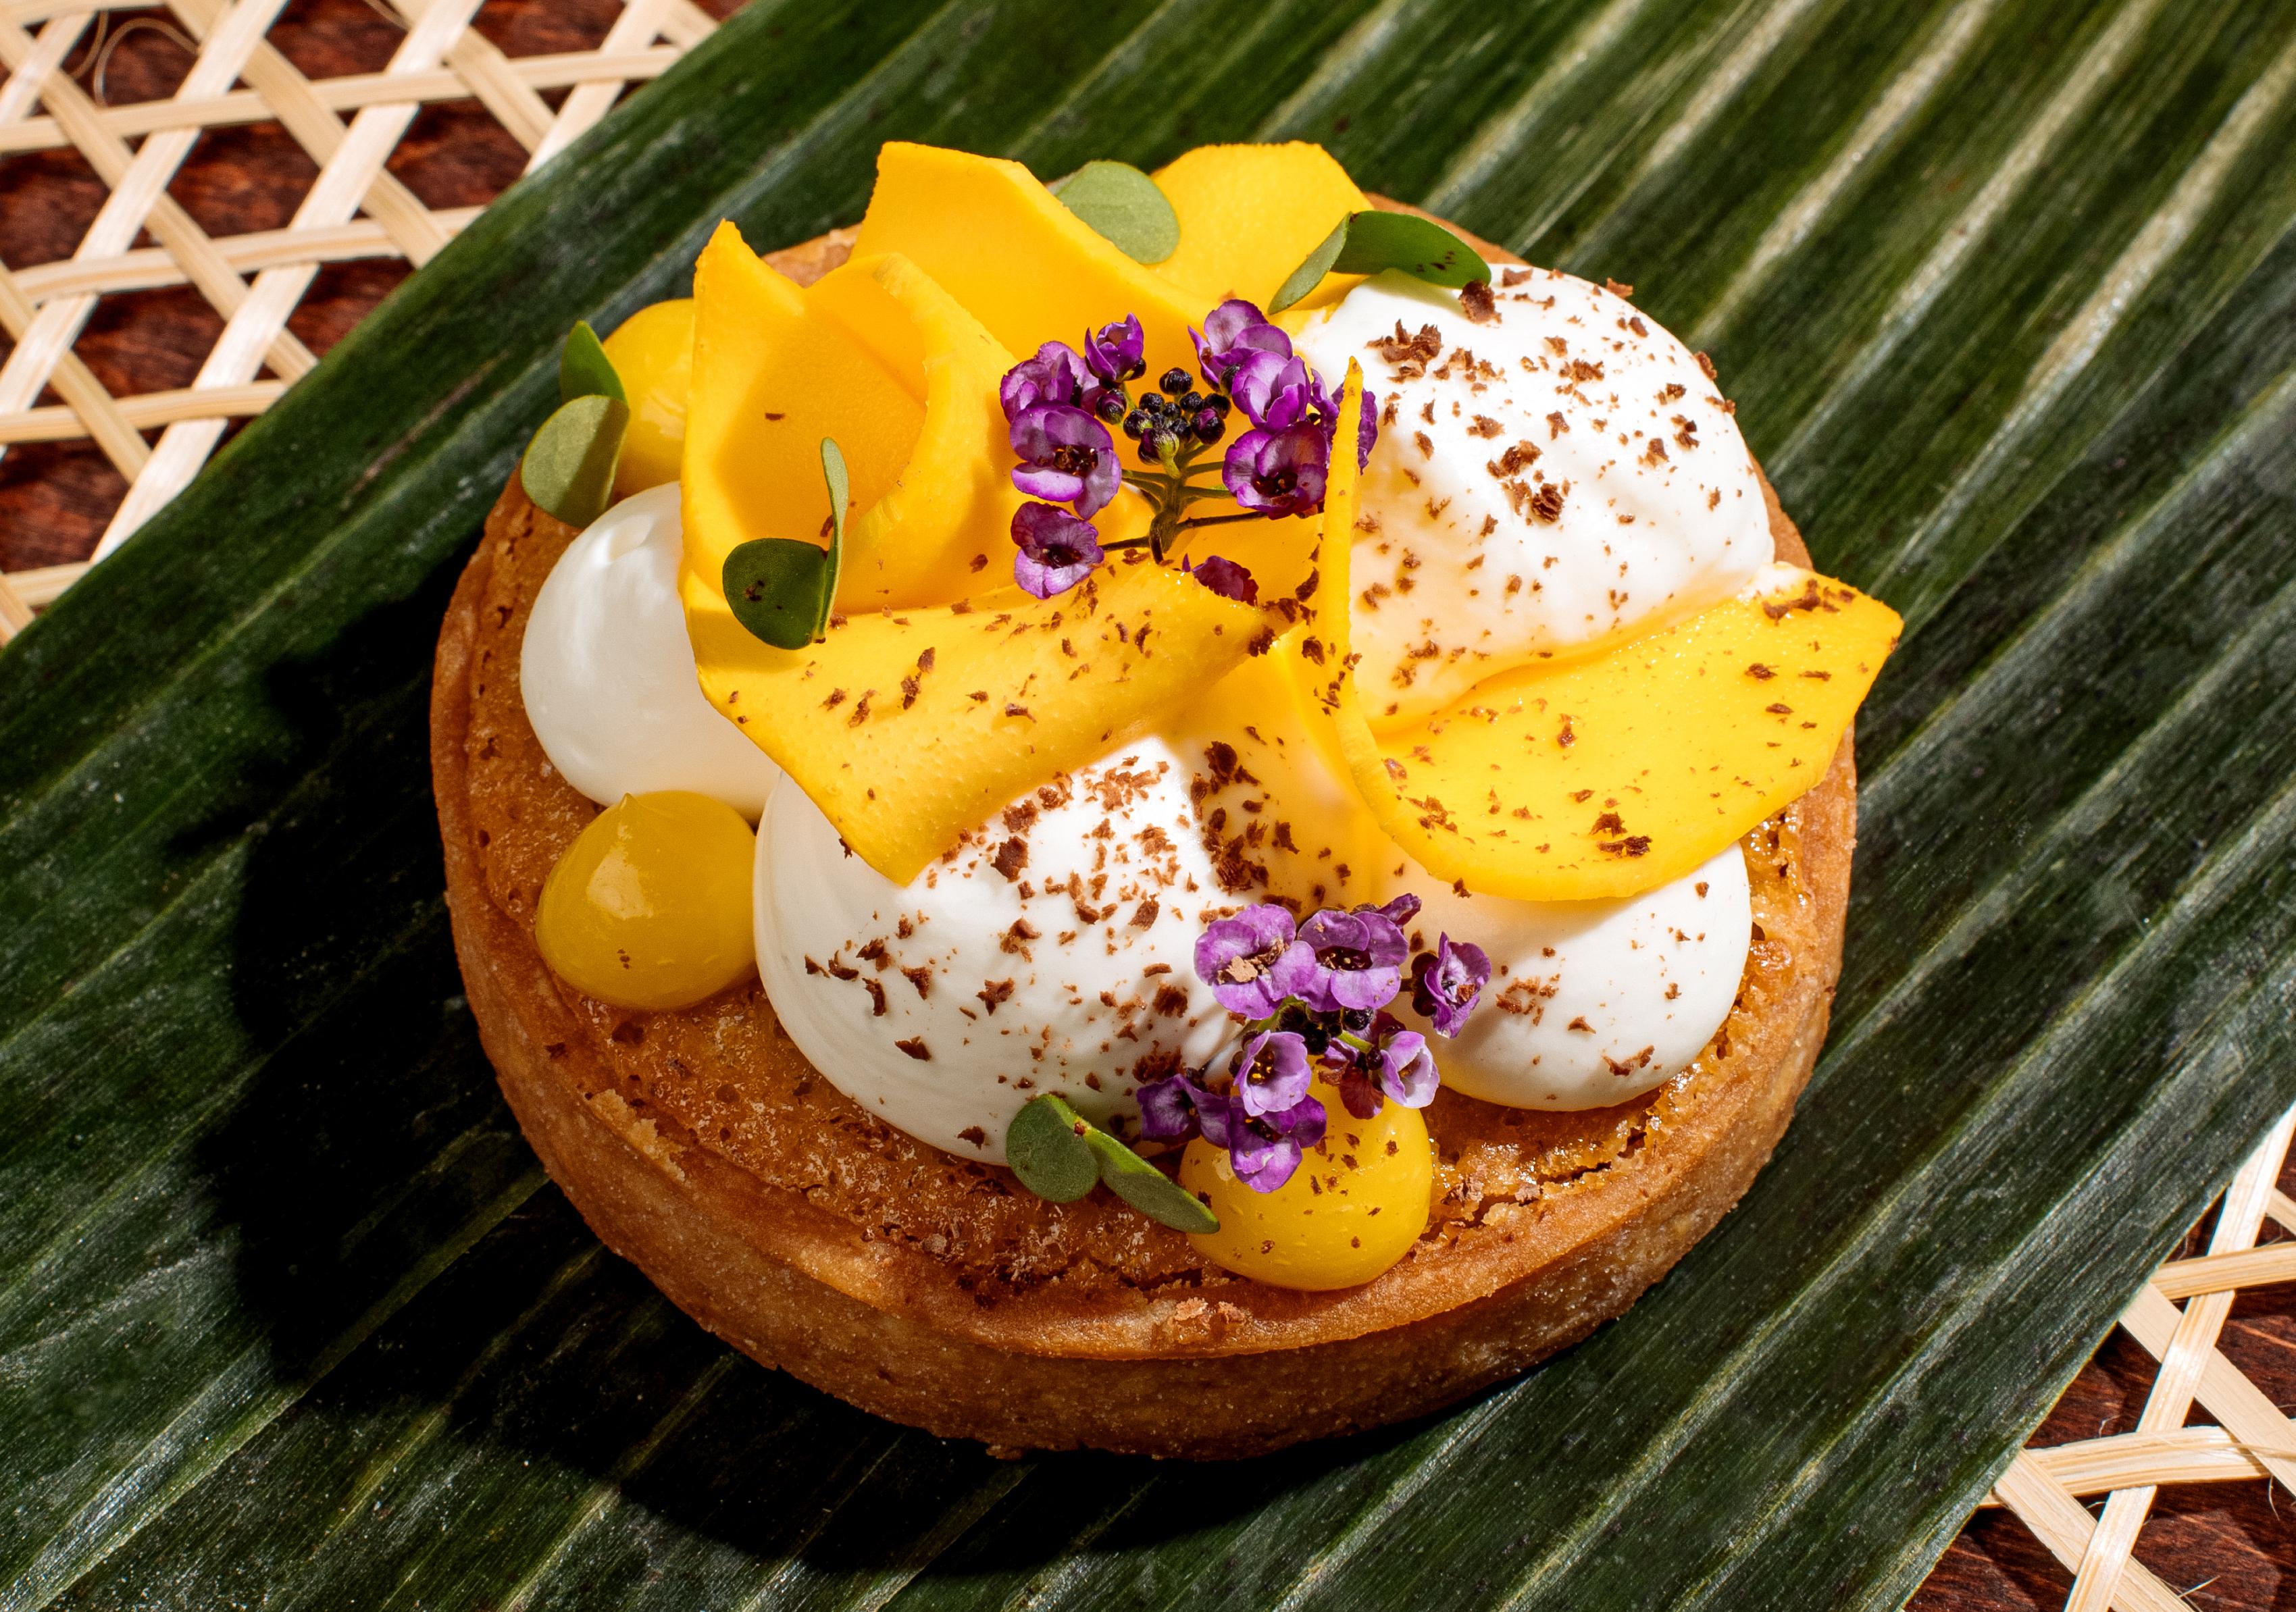 Dessert at Abaca